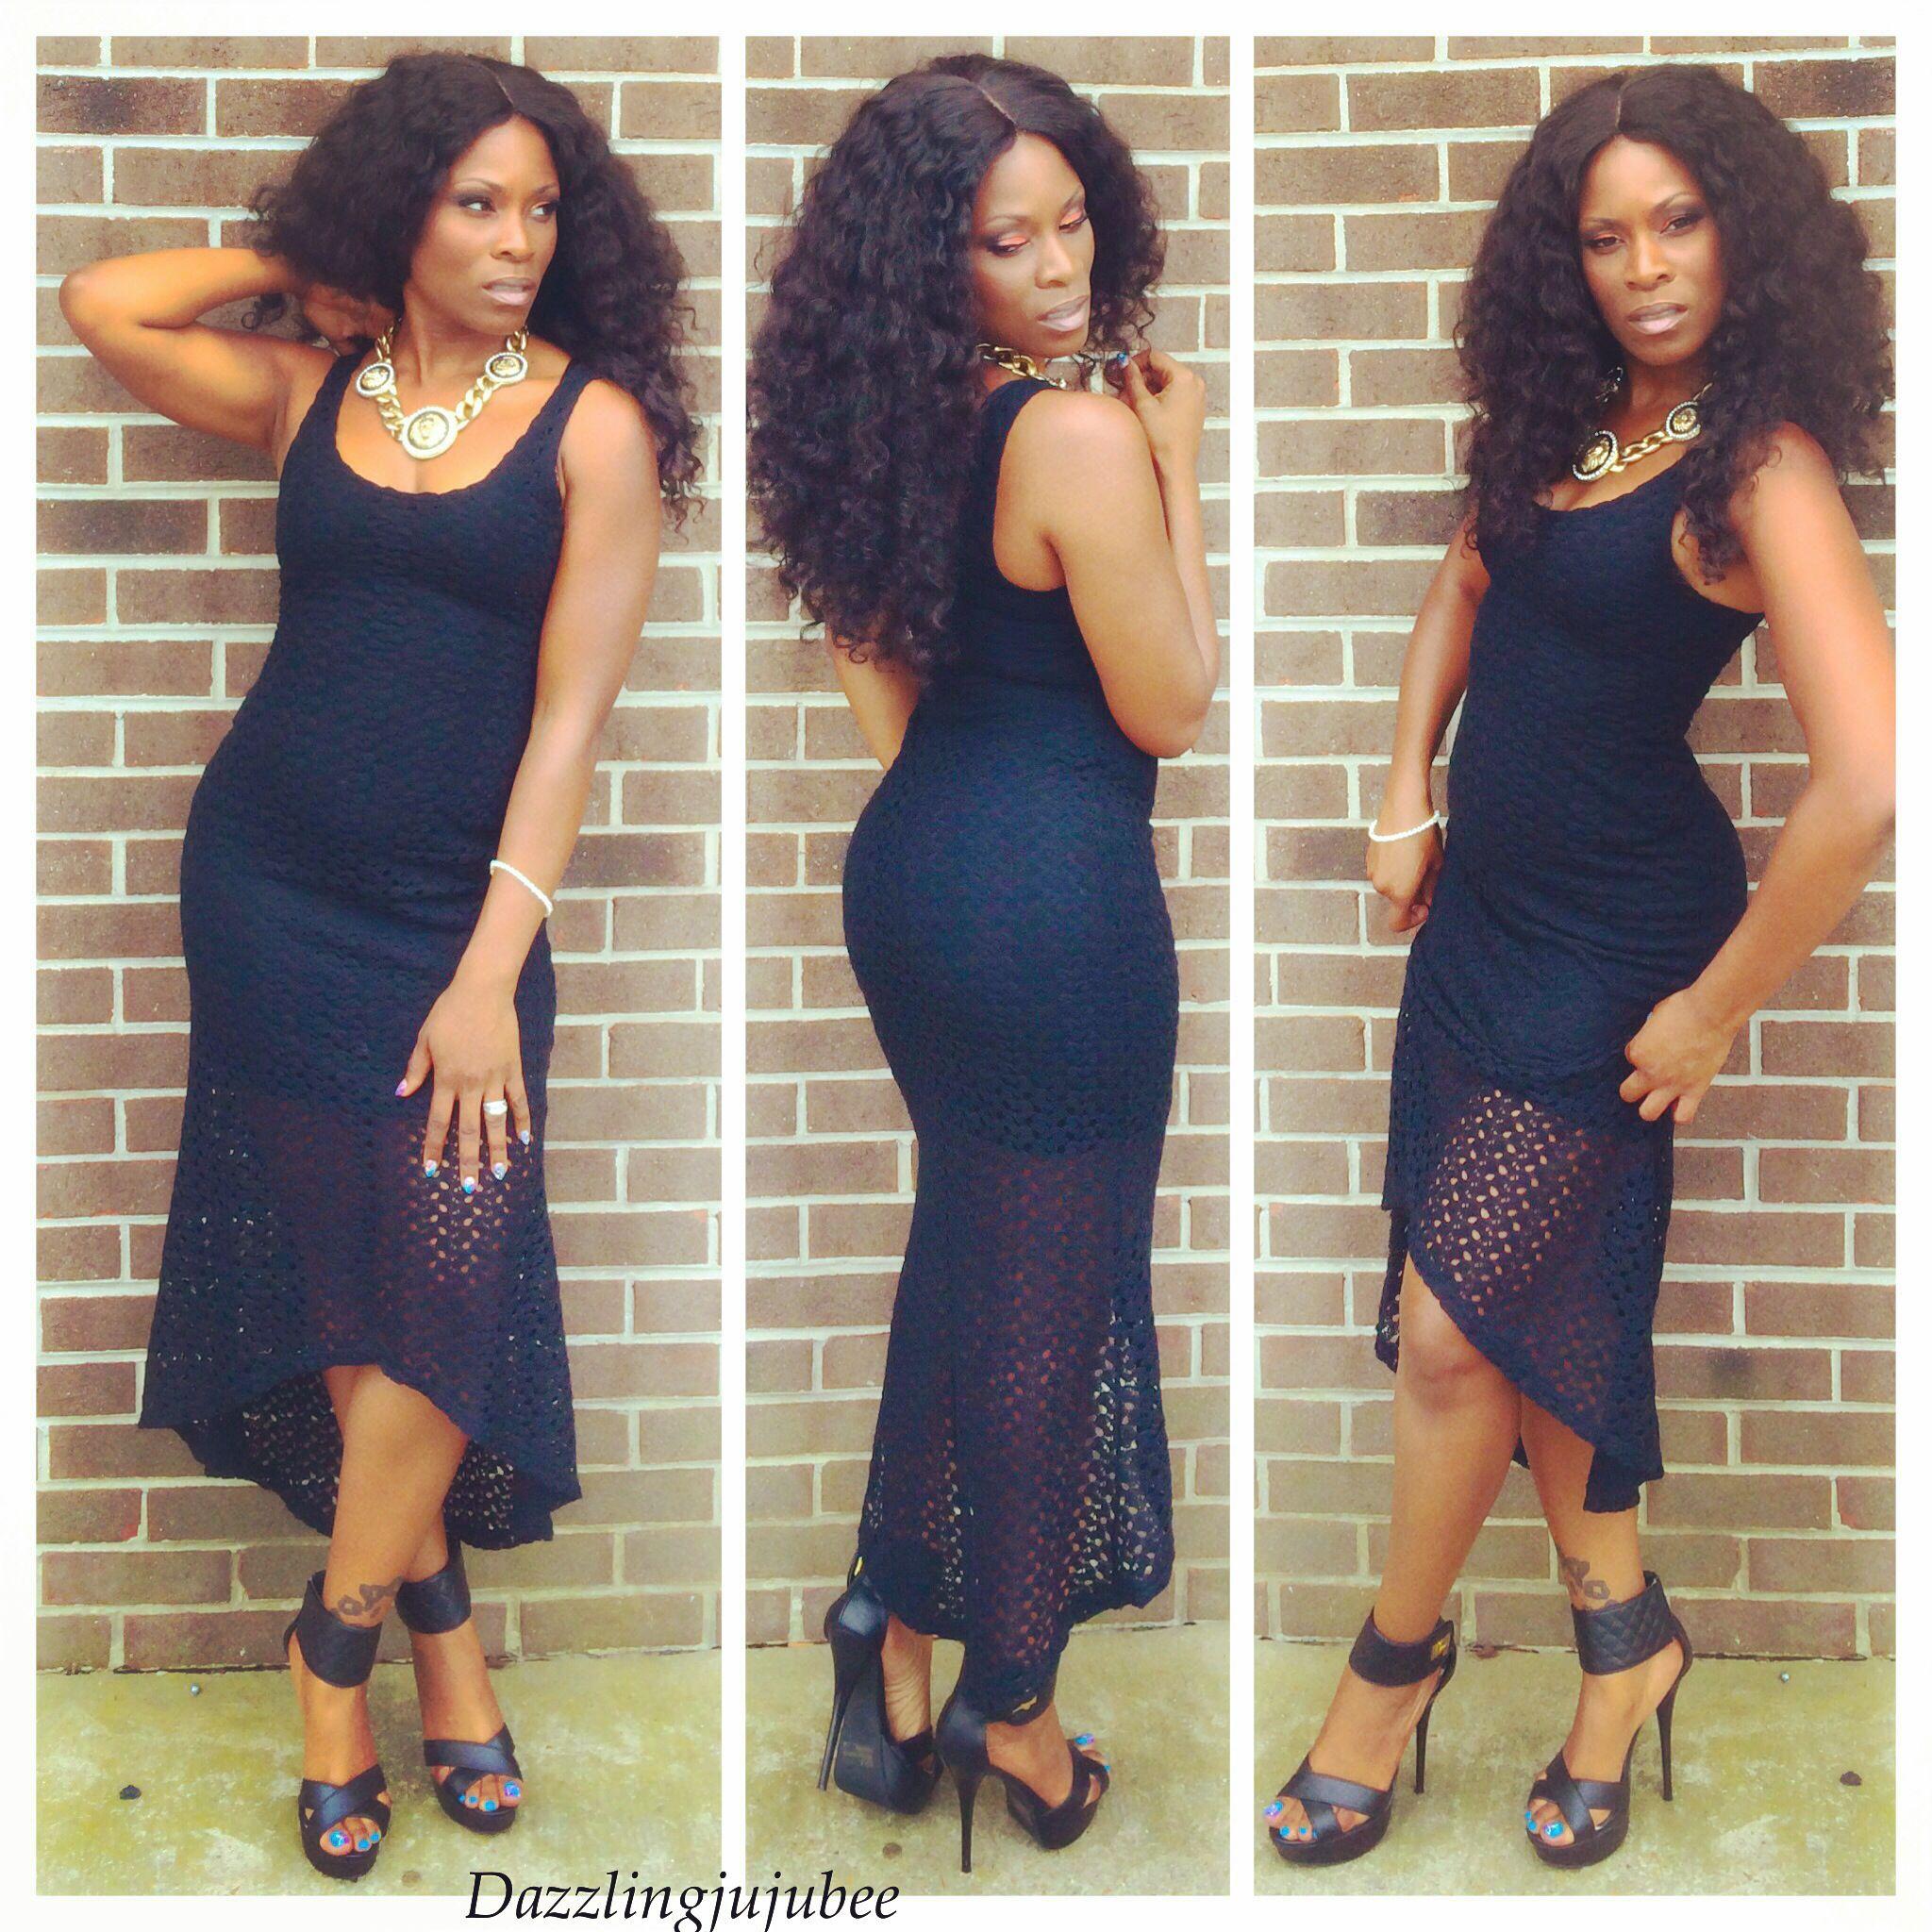 The #designdimediva has arrived #haitiandiva #showthemjuju #haitianwomenkillingit #beauty #style #jazzyjujubee #hairgoddess #chic #beautiful #fashion #braids #sassy #sexy #barbiedoll #idothisflawlessly  #diva #haitian